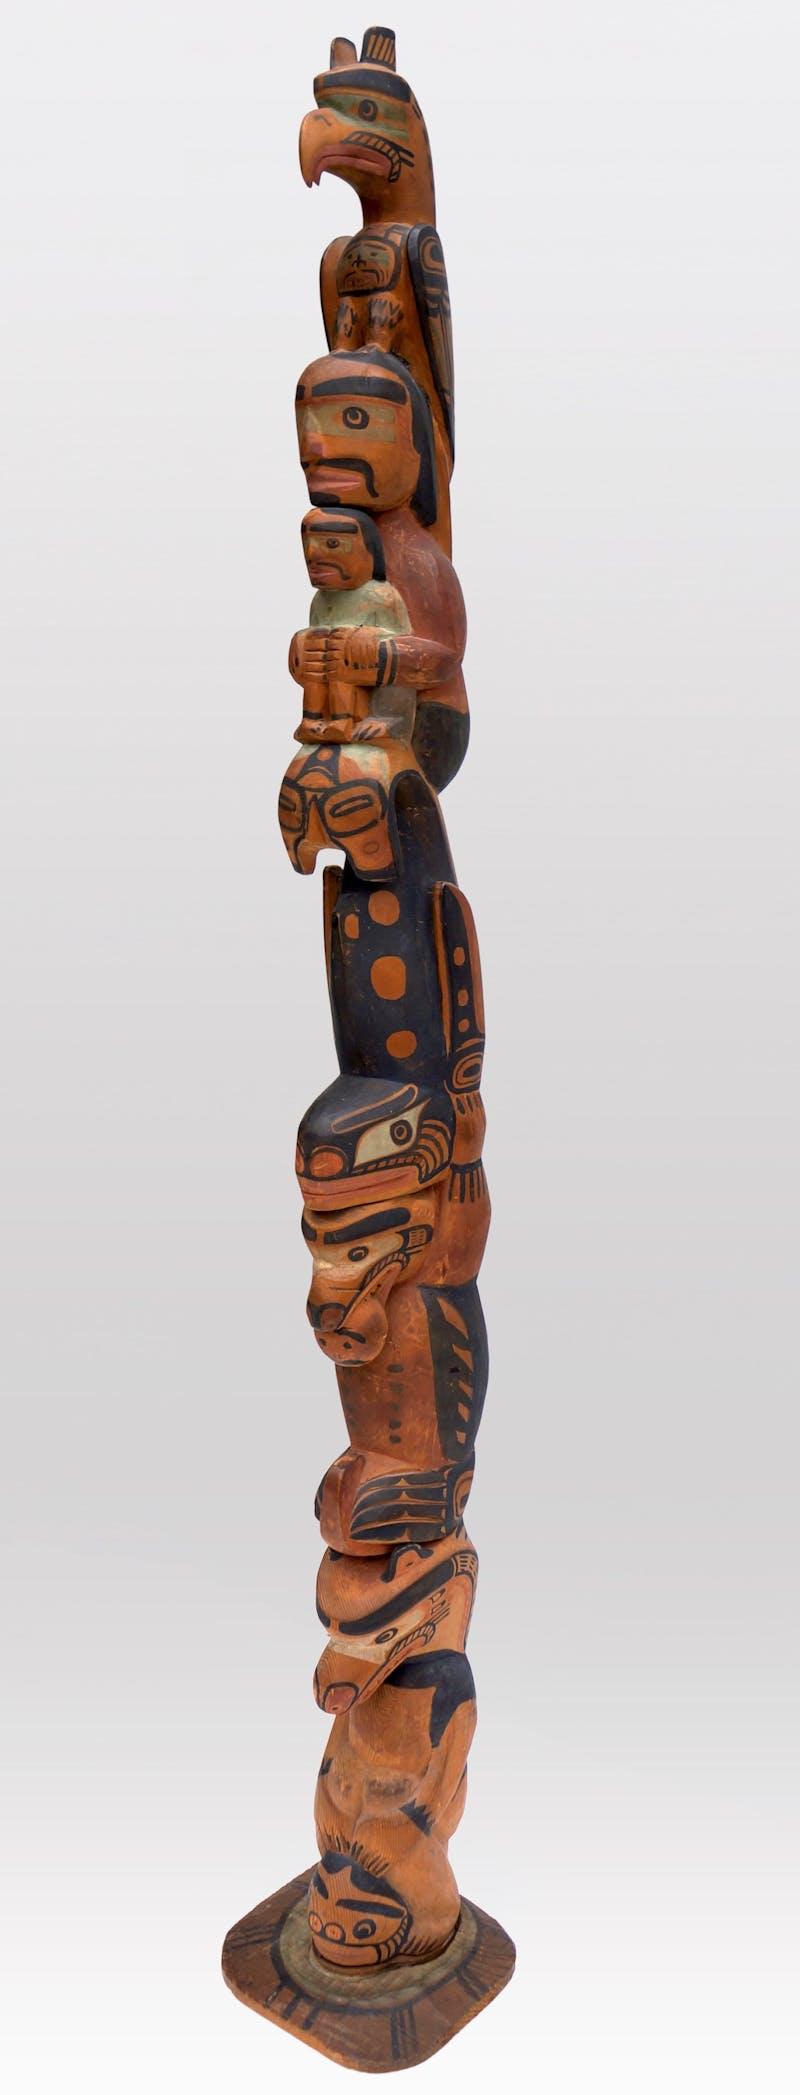 Model Totem Pole Image 1